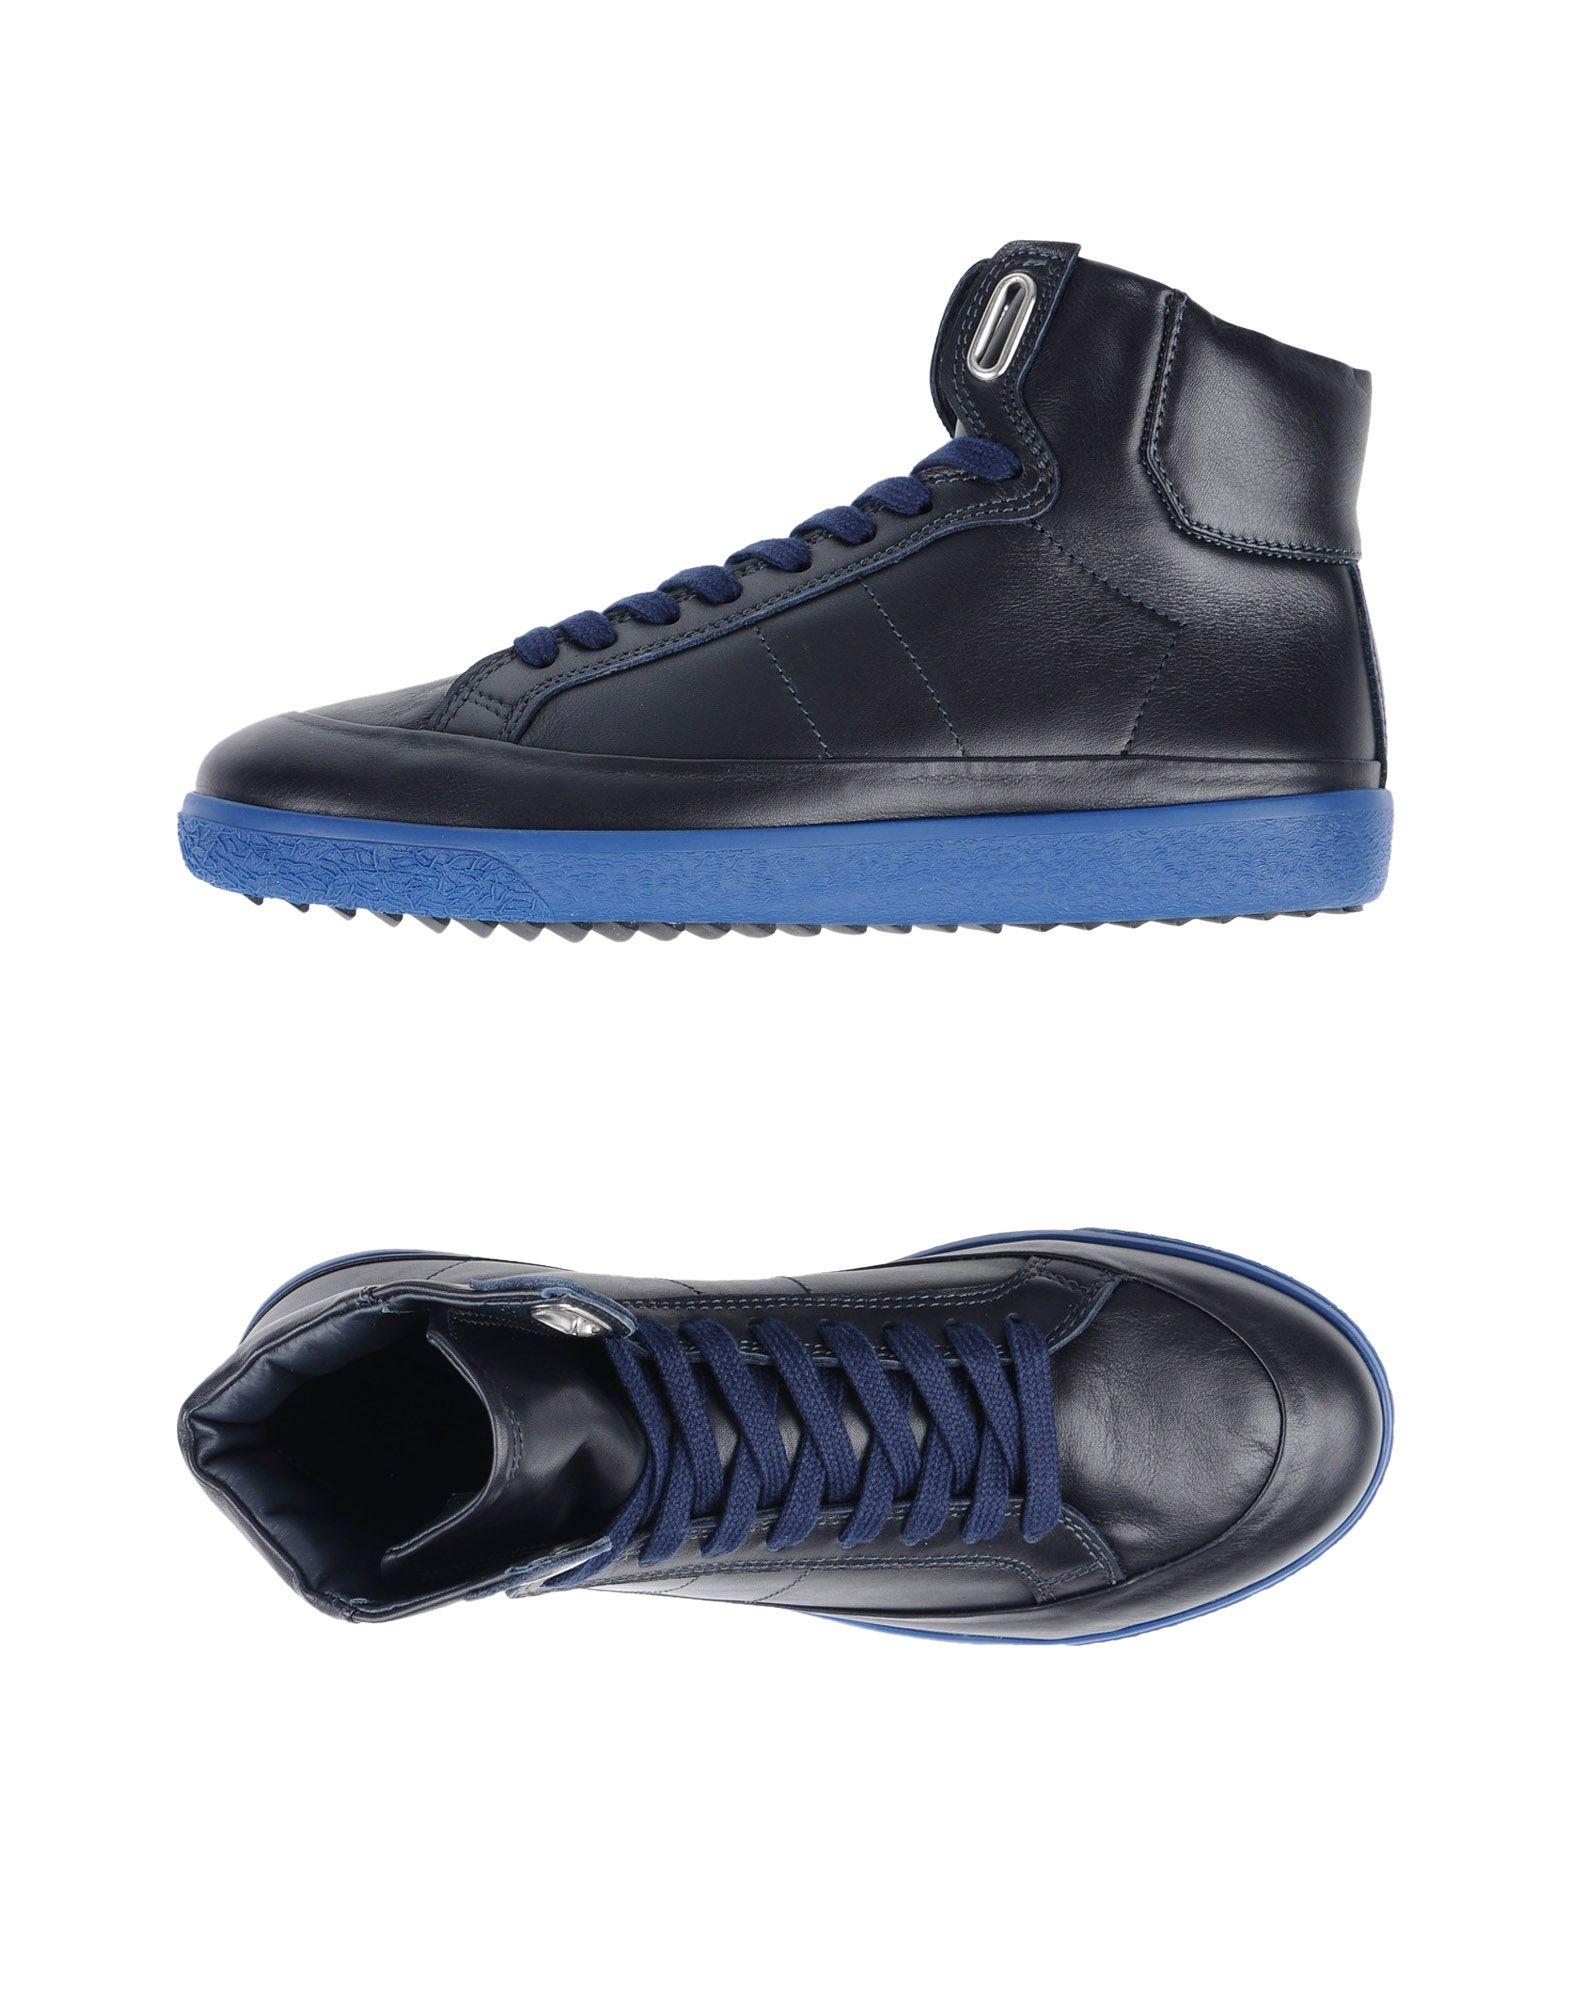 Stilvolle billige Schuhe Pantofola D'oro D'oro D'oro Sneakers Damen  11339278OM 1681f0